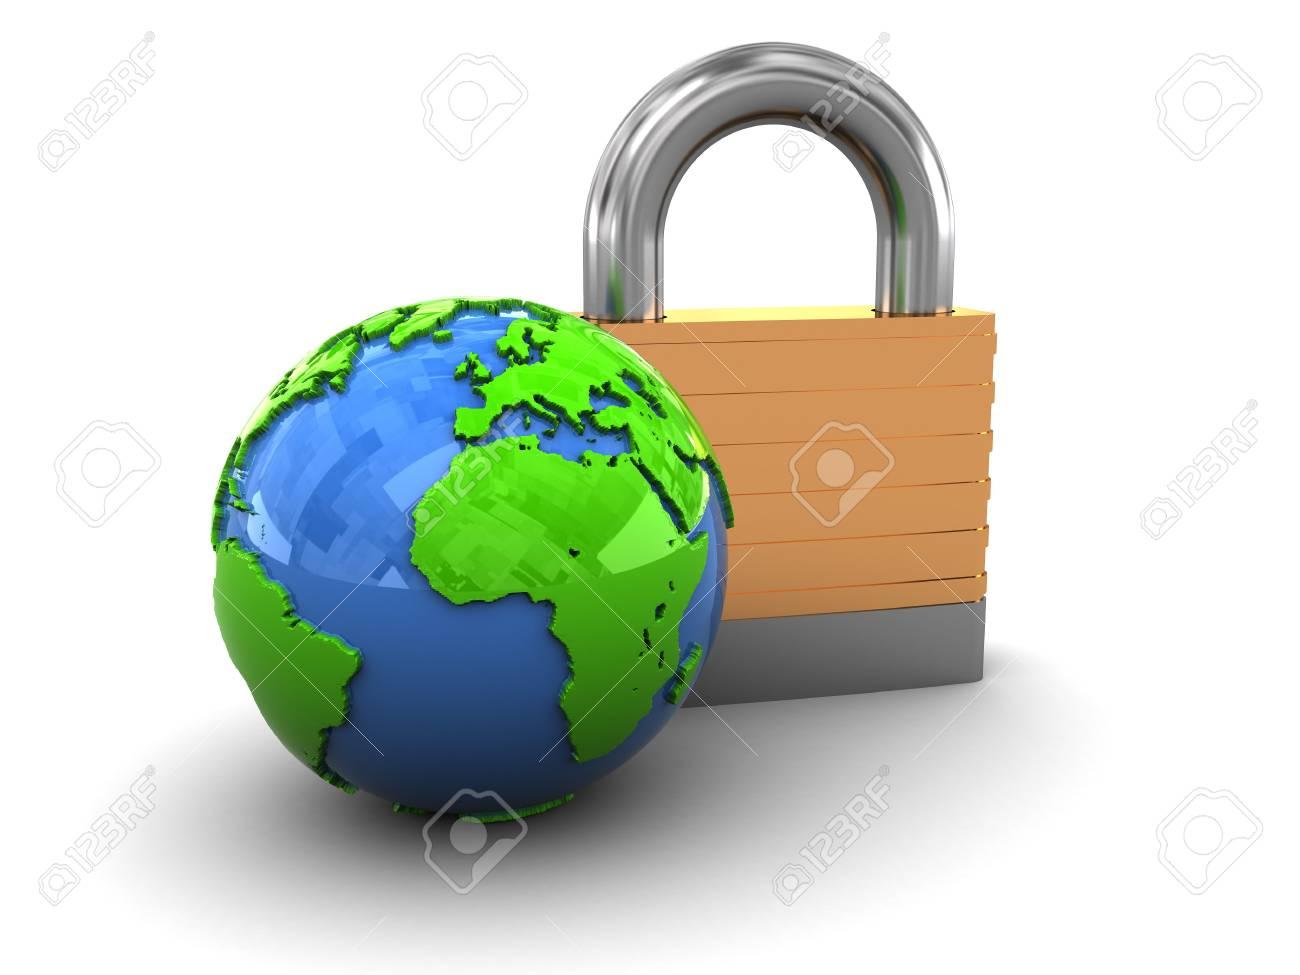 3d illustration of padlock and earth globe over white background Stock Illustration - 5610644